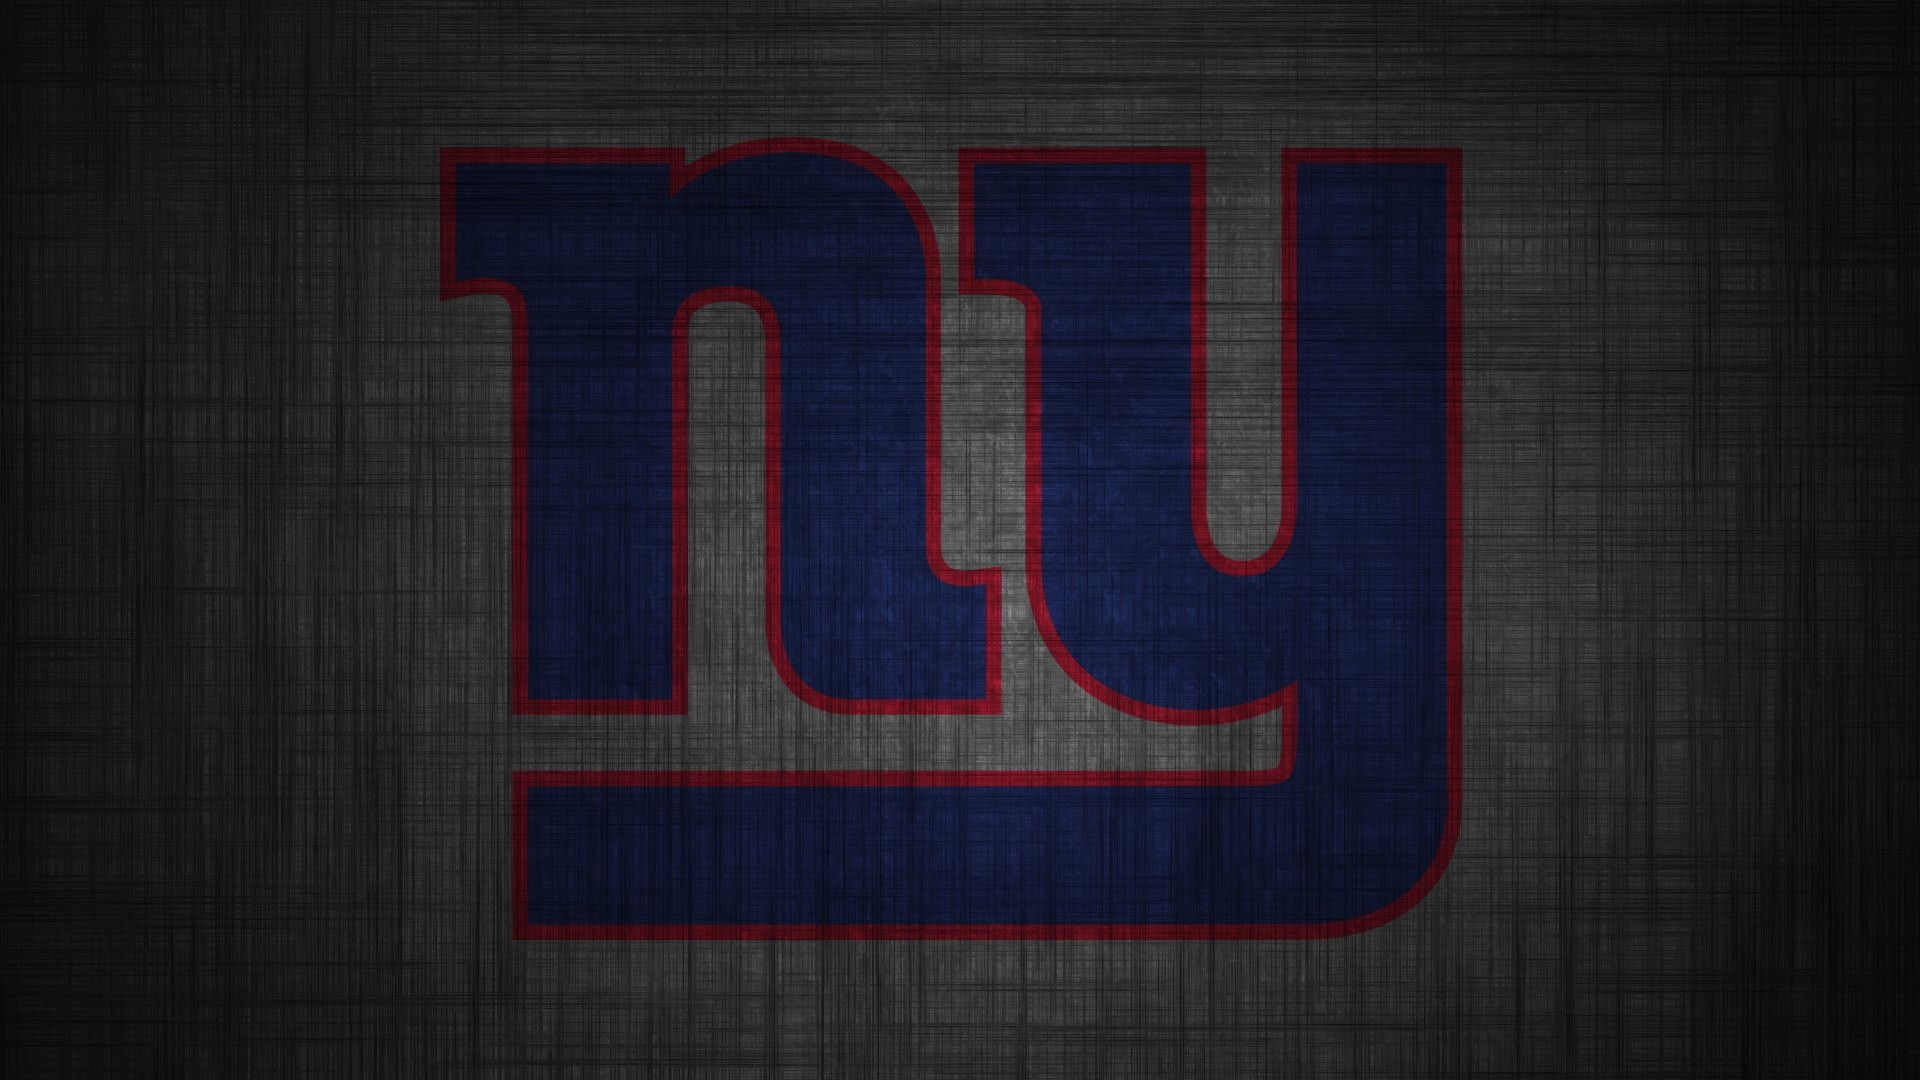 New York Giants Wallpapers ·① WallpaperTag